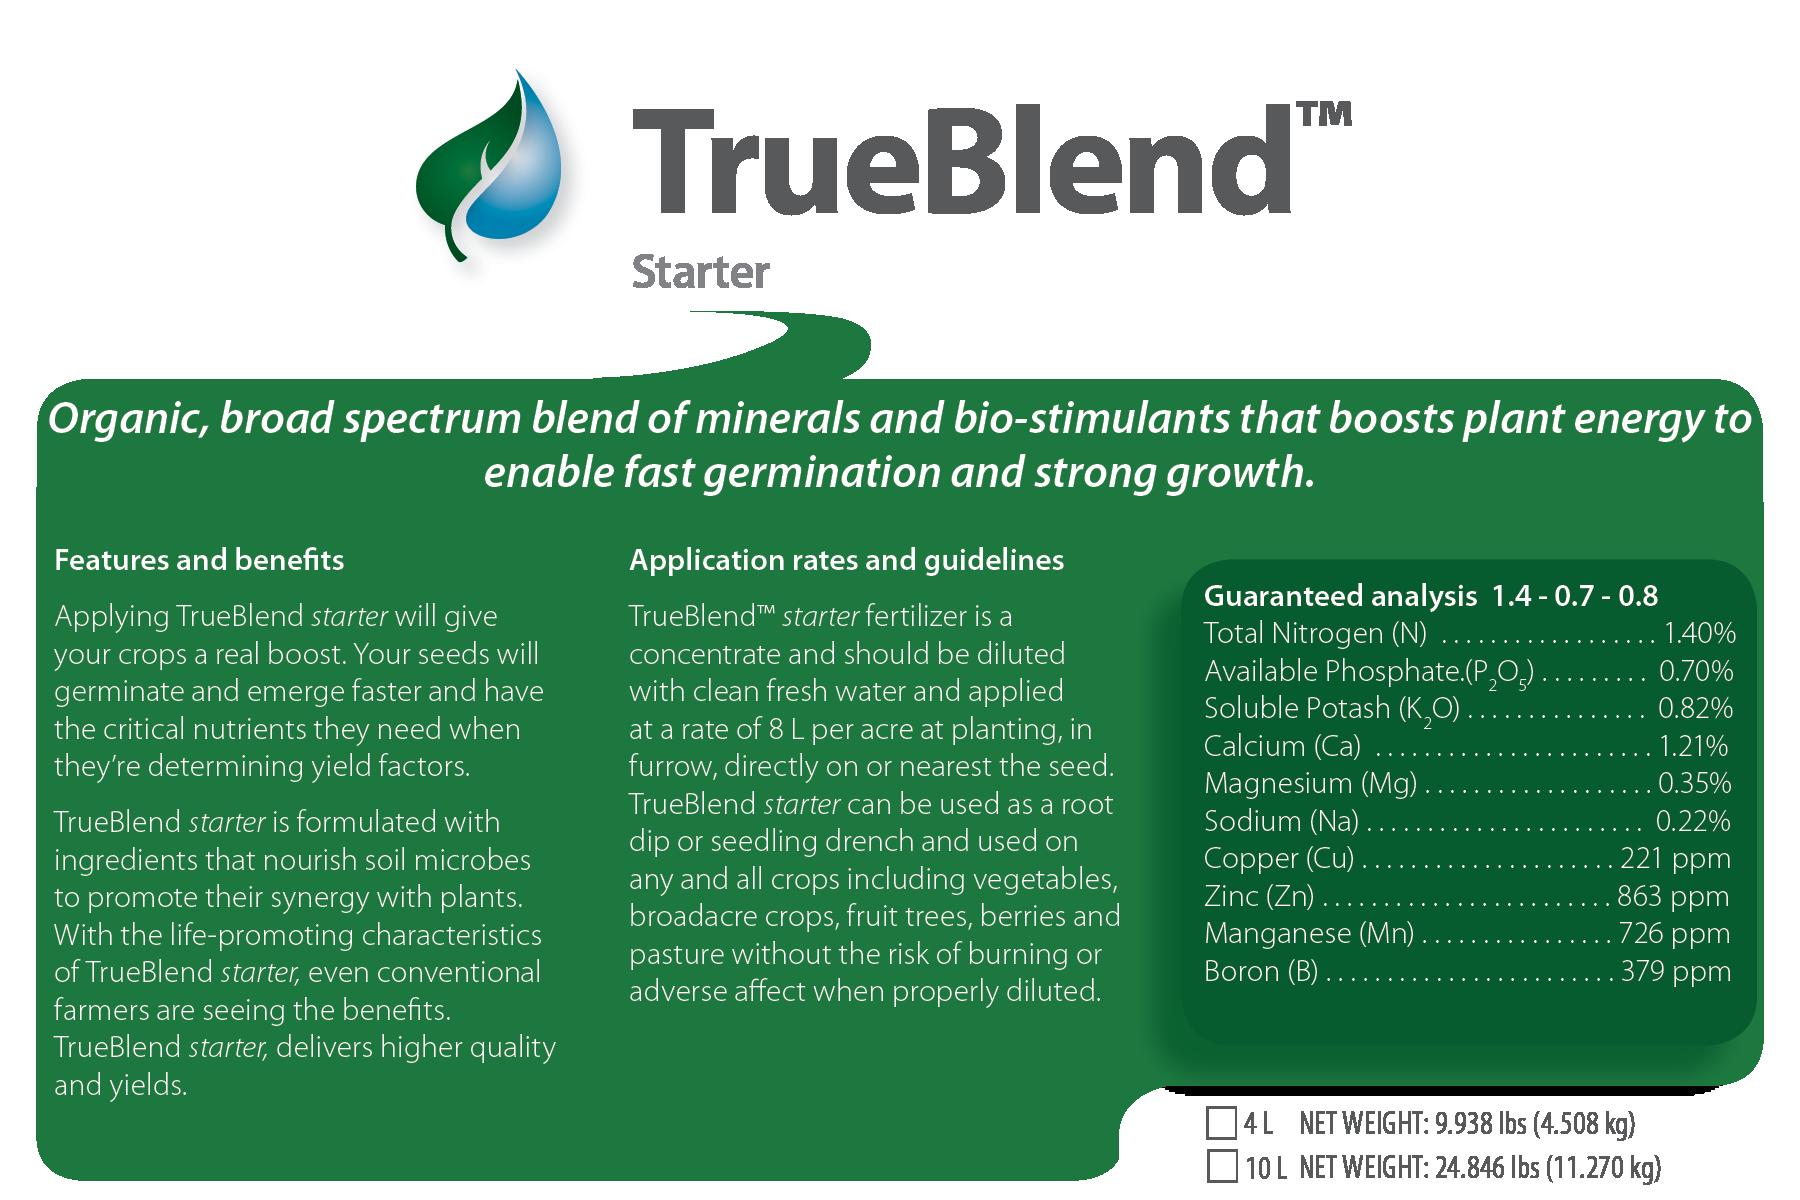 TrueBlend Starter